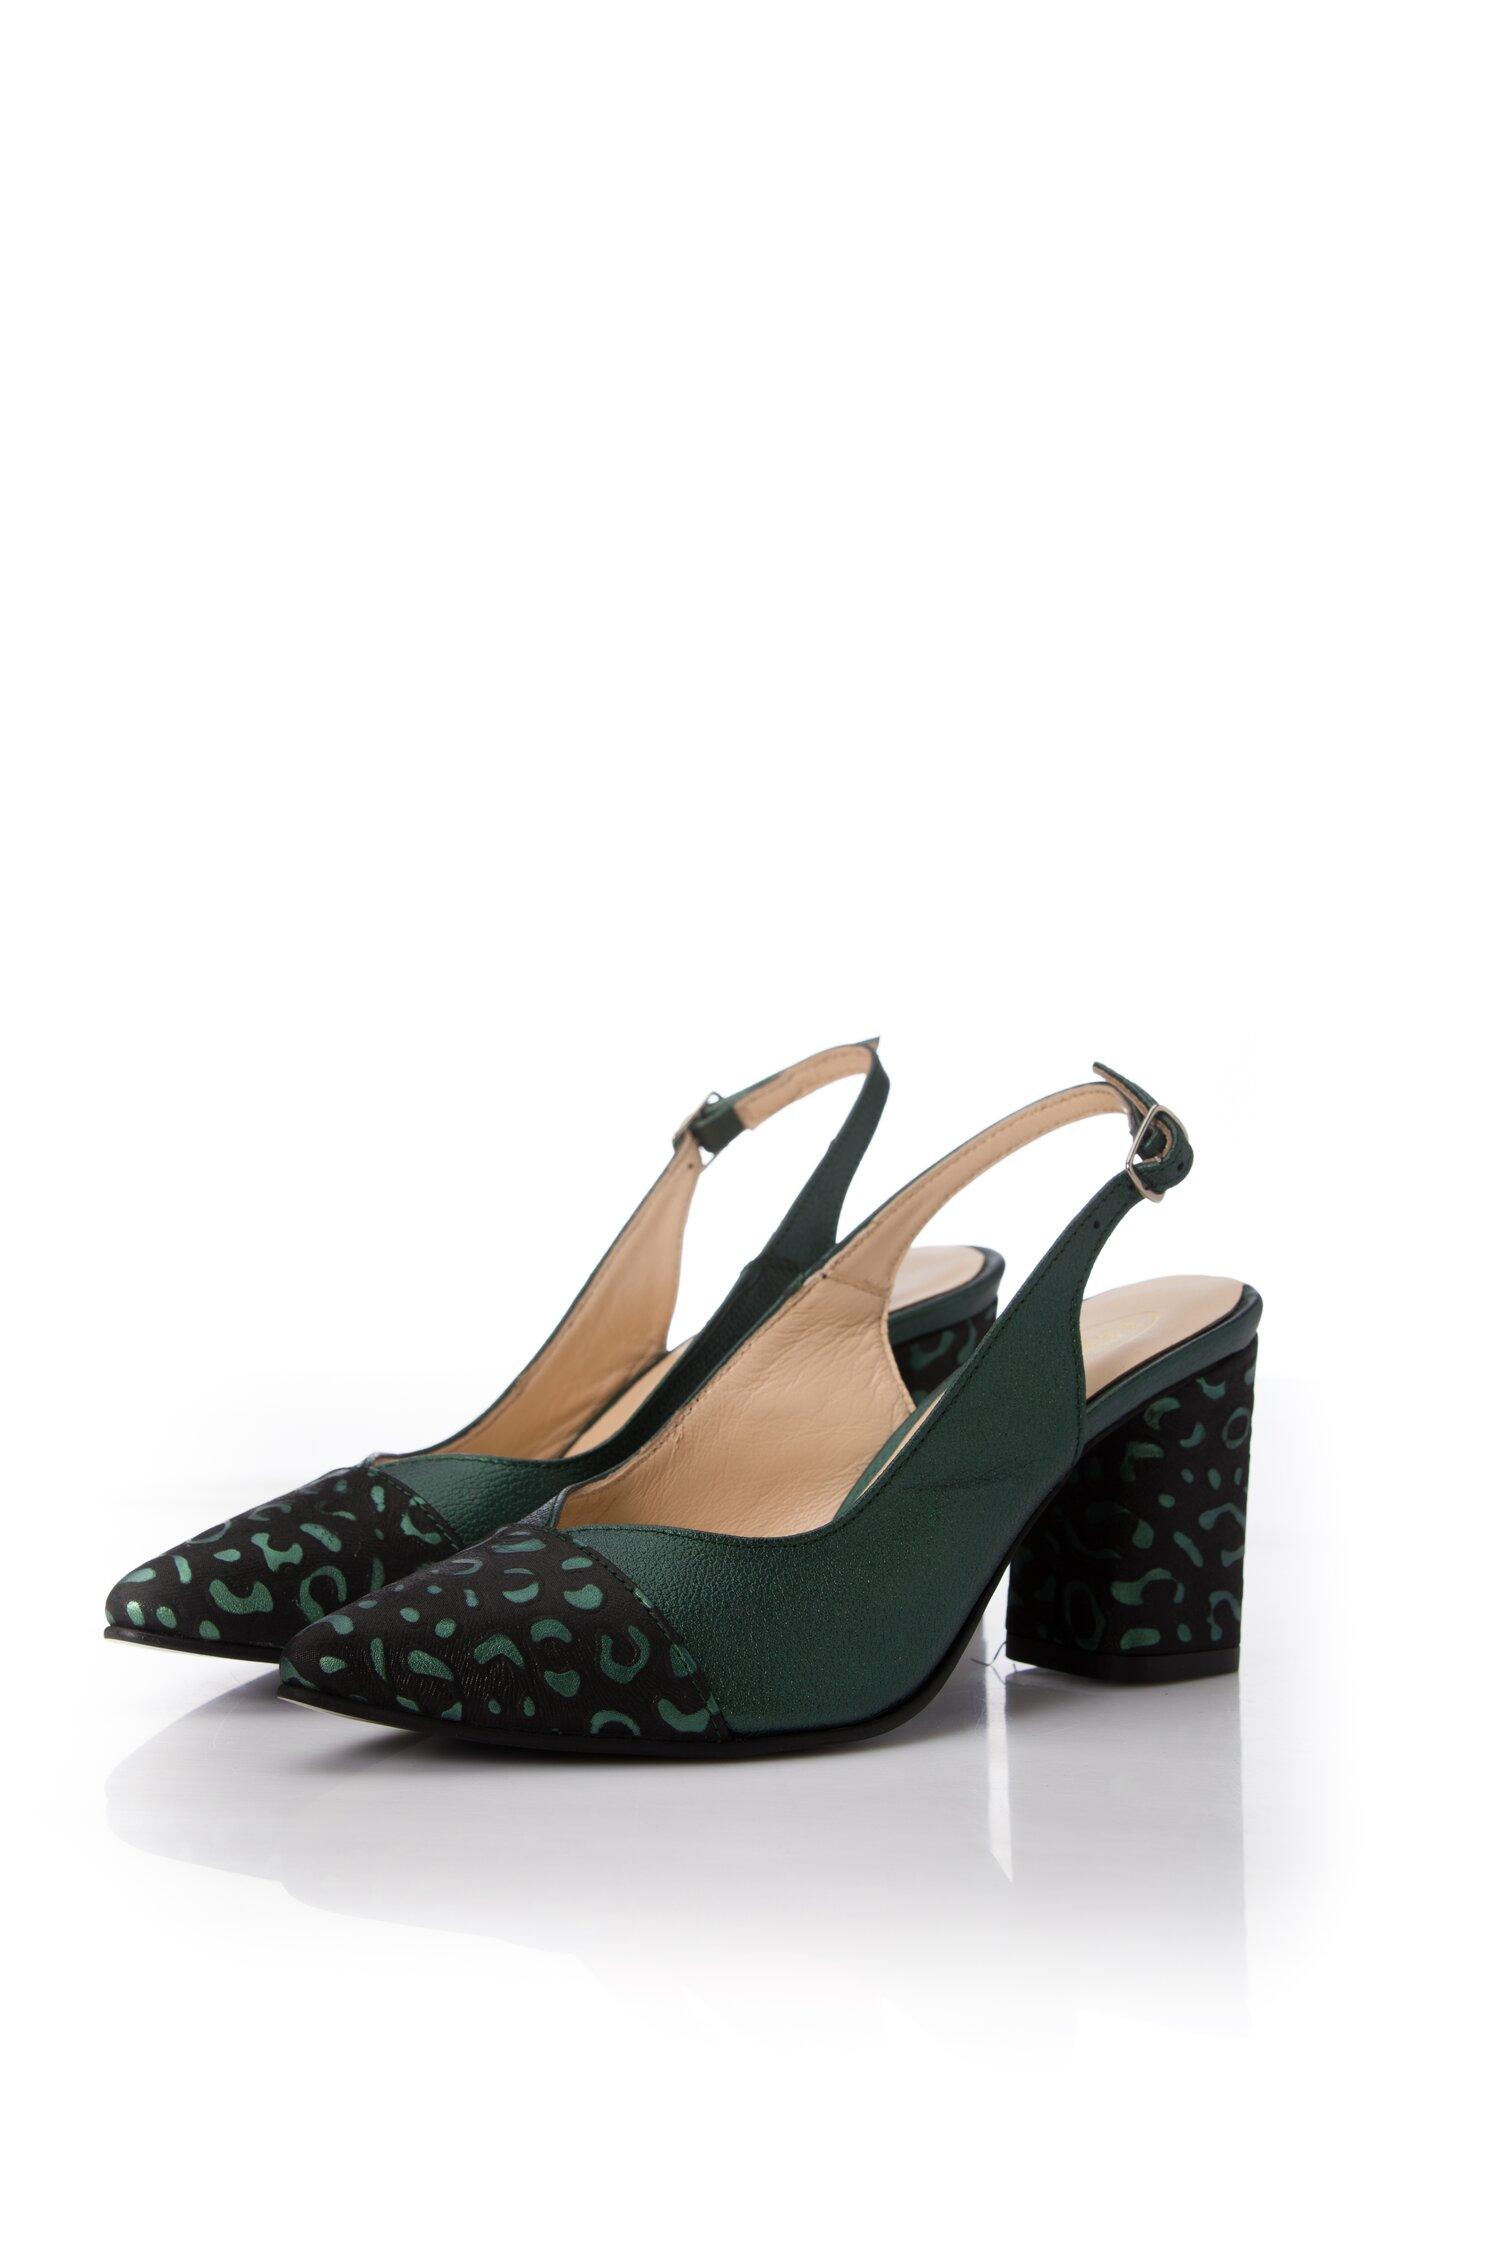 Pantofi verzi metalizat cu decupaj la calcai cu imprimeu leopard pe varf si toc